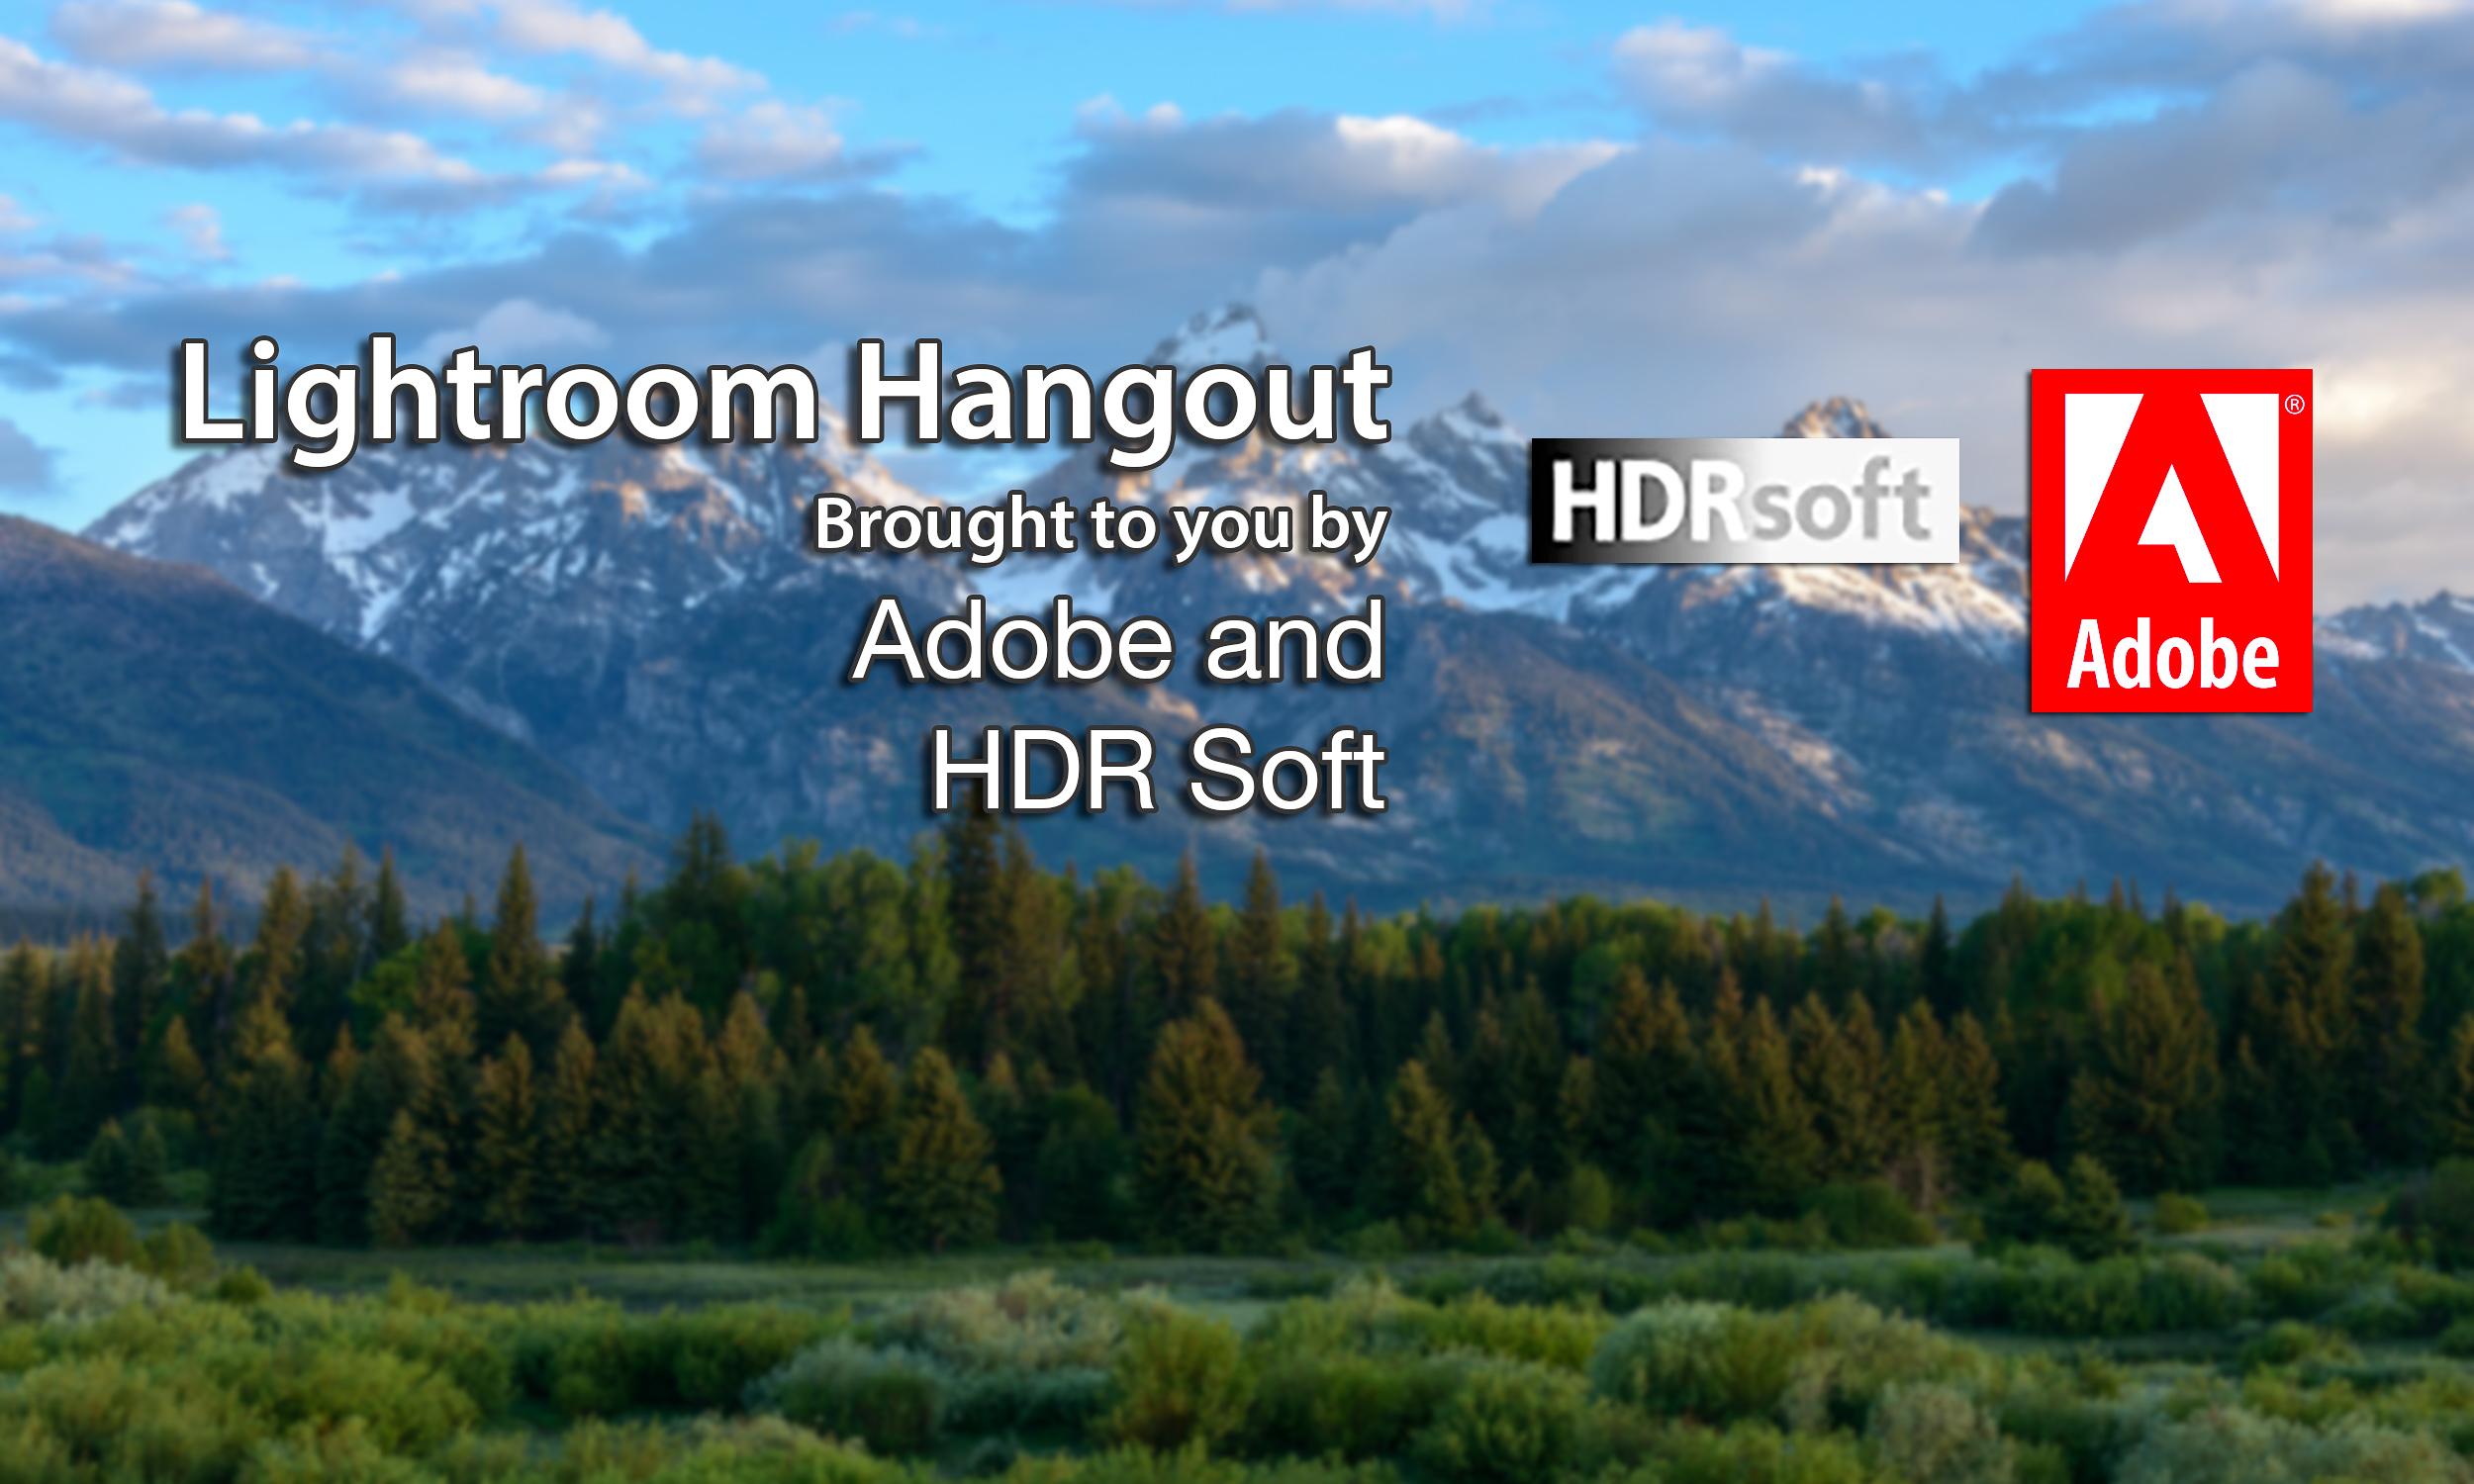 LightroomHangoutAdobeHDR-1